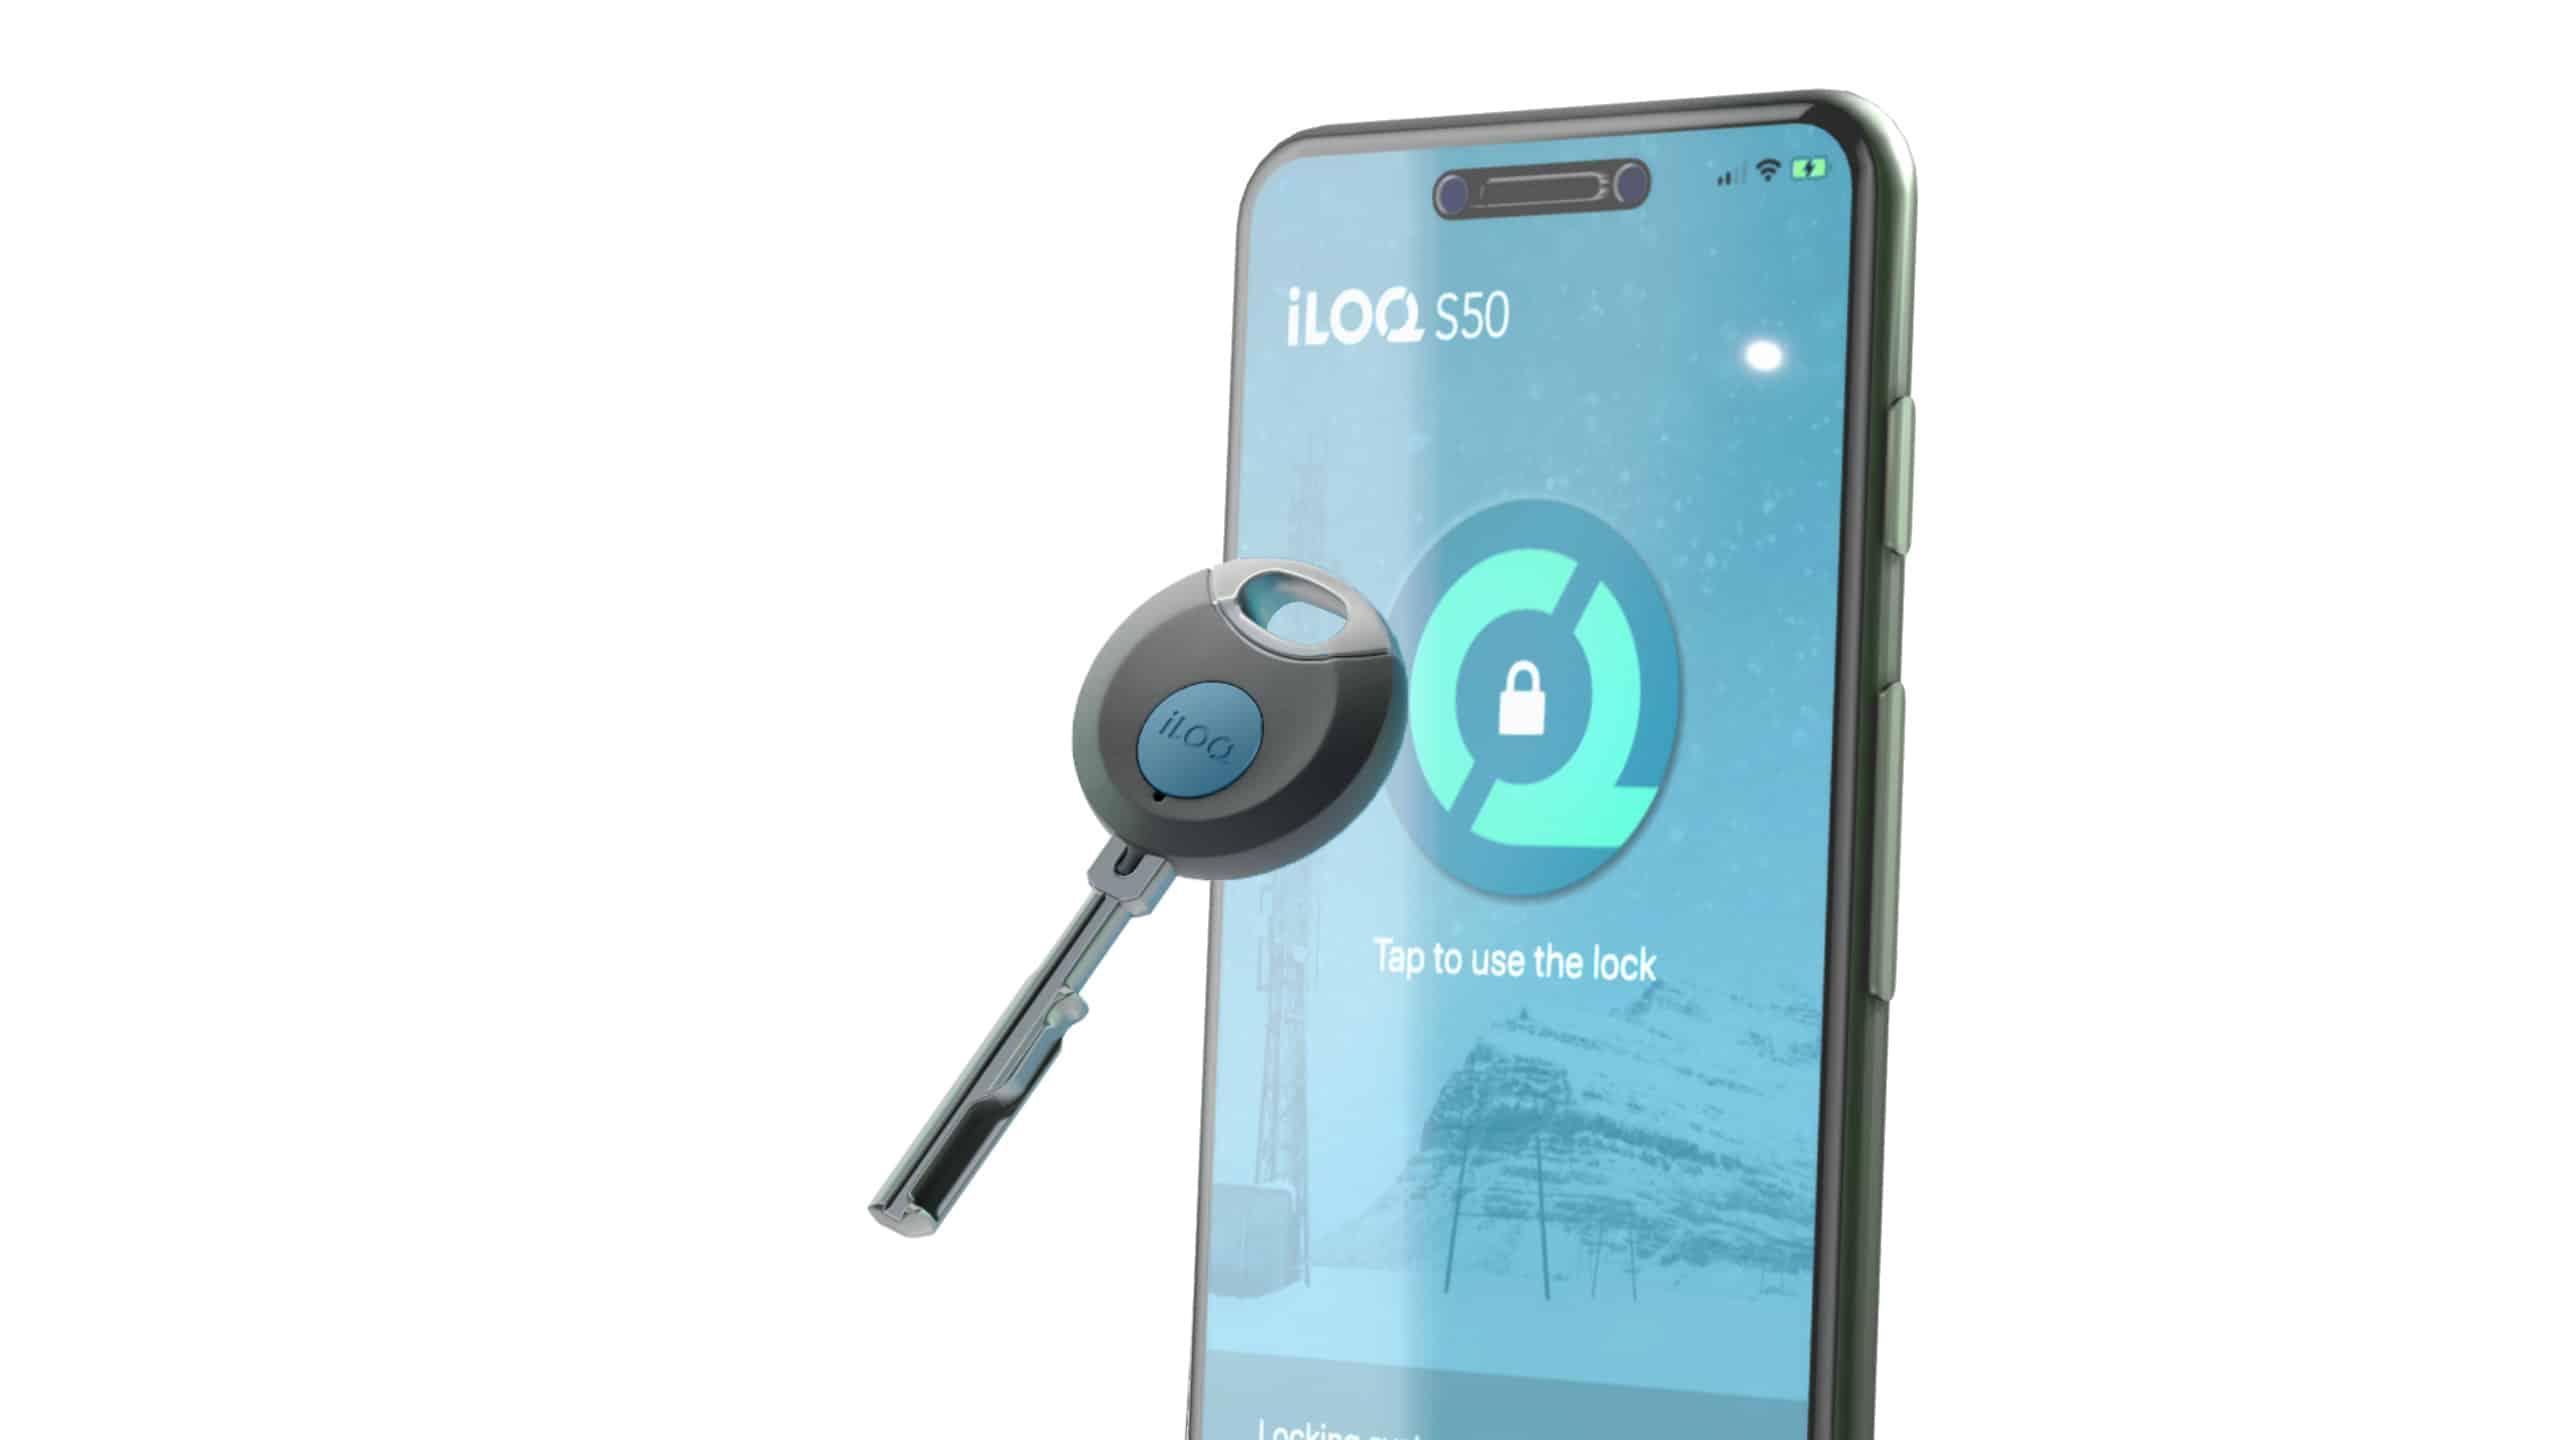 iLOQ_5series_phone and key